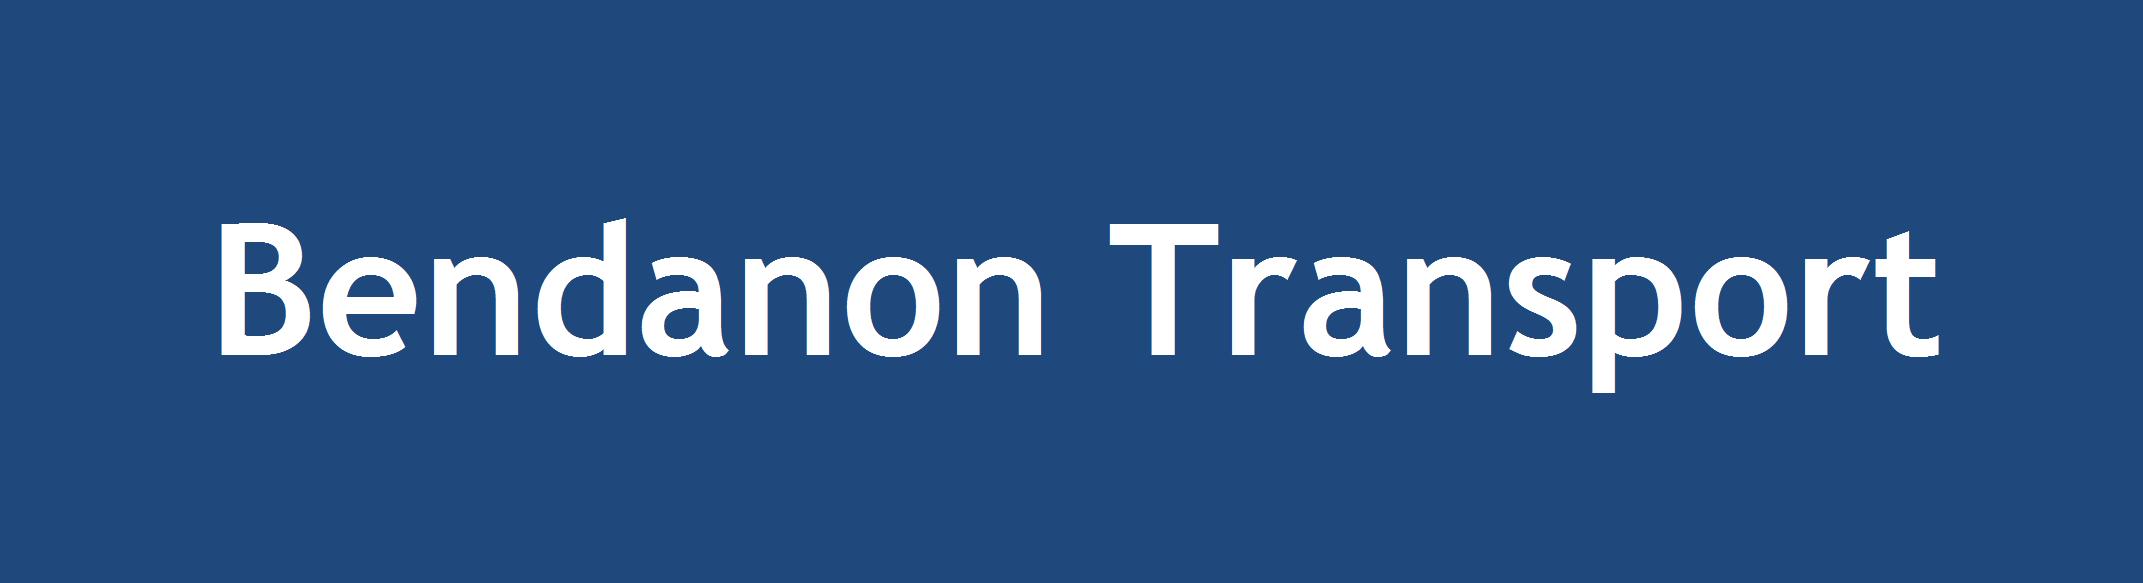 Bendanon Transport Logo